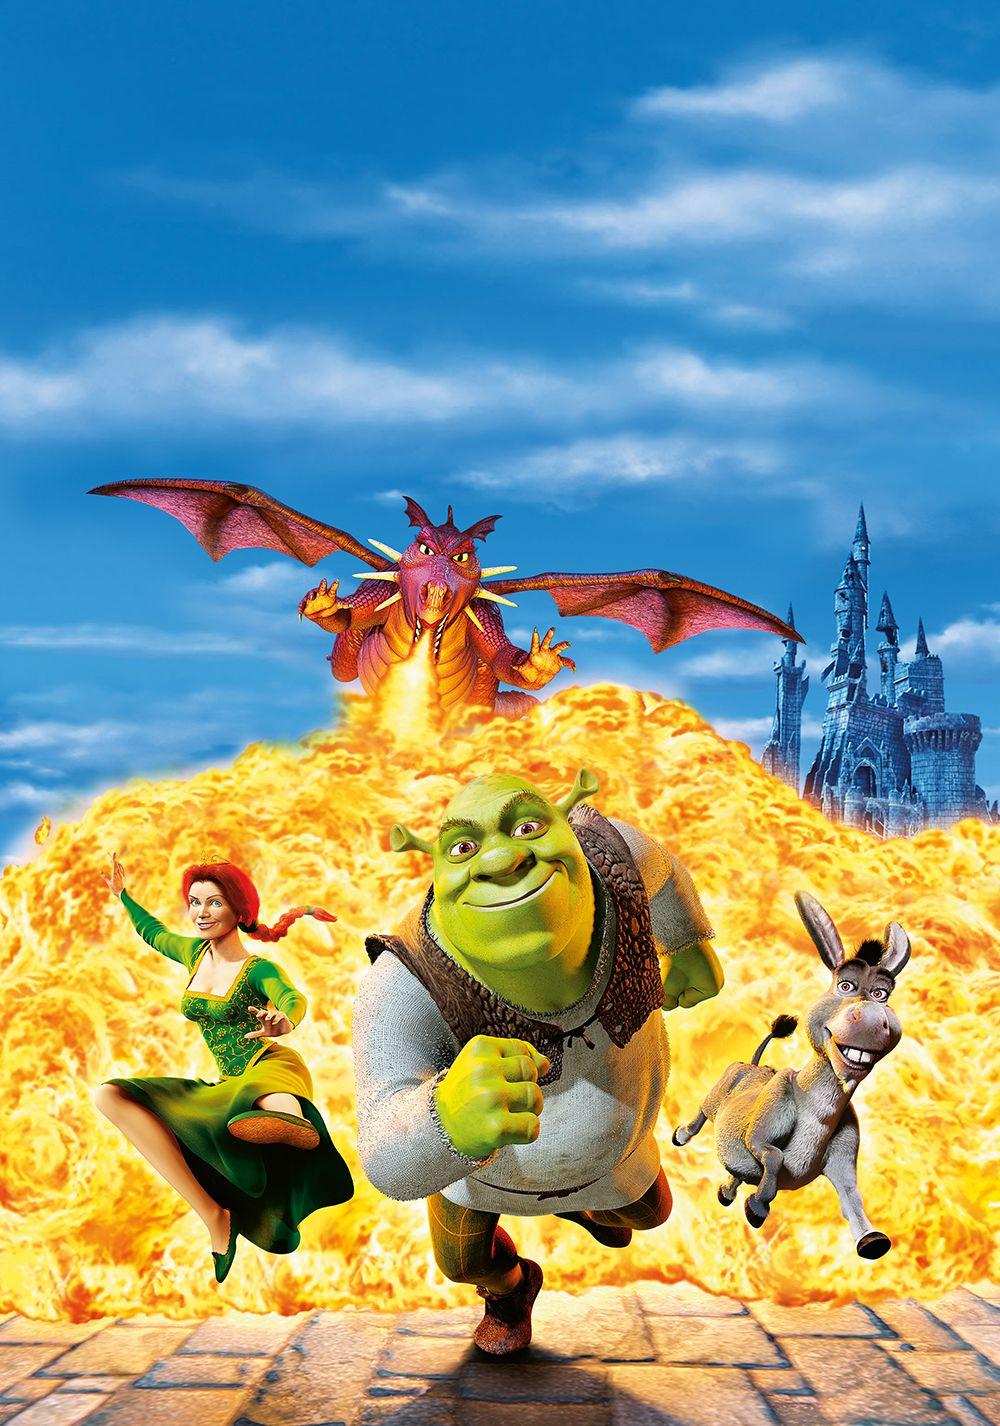 Pin de Teri Lorrence em It's Only MakeBelieve Shrek